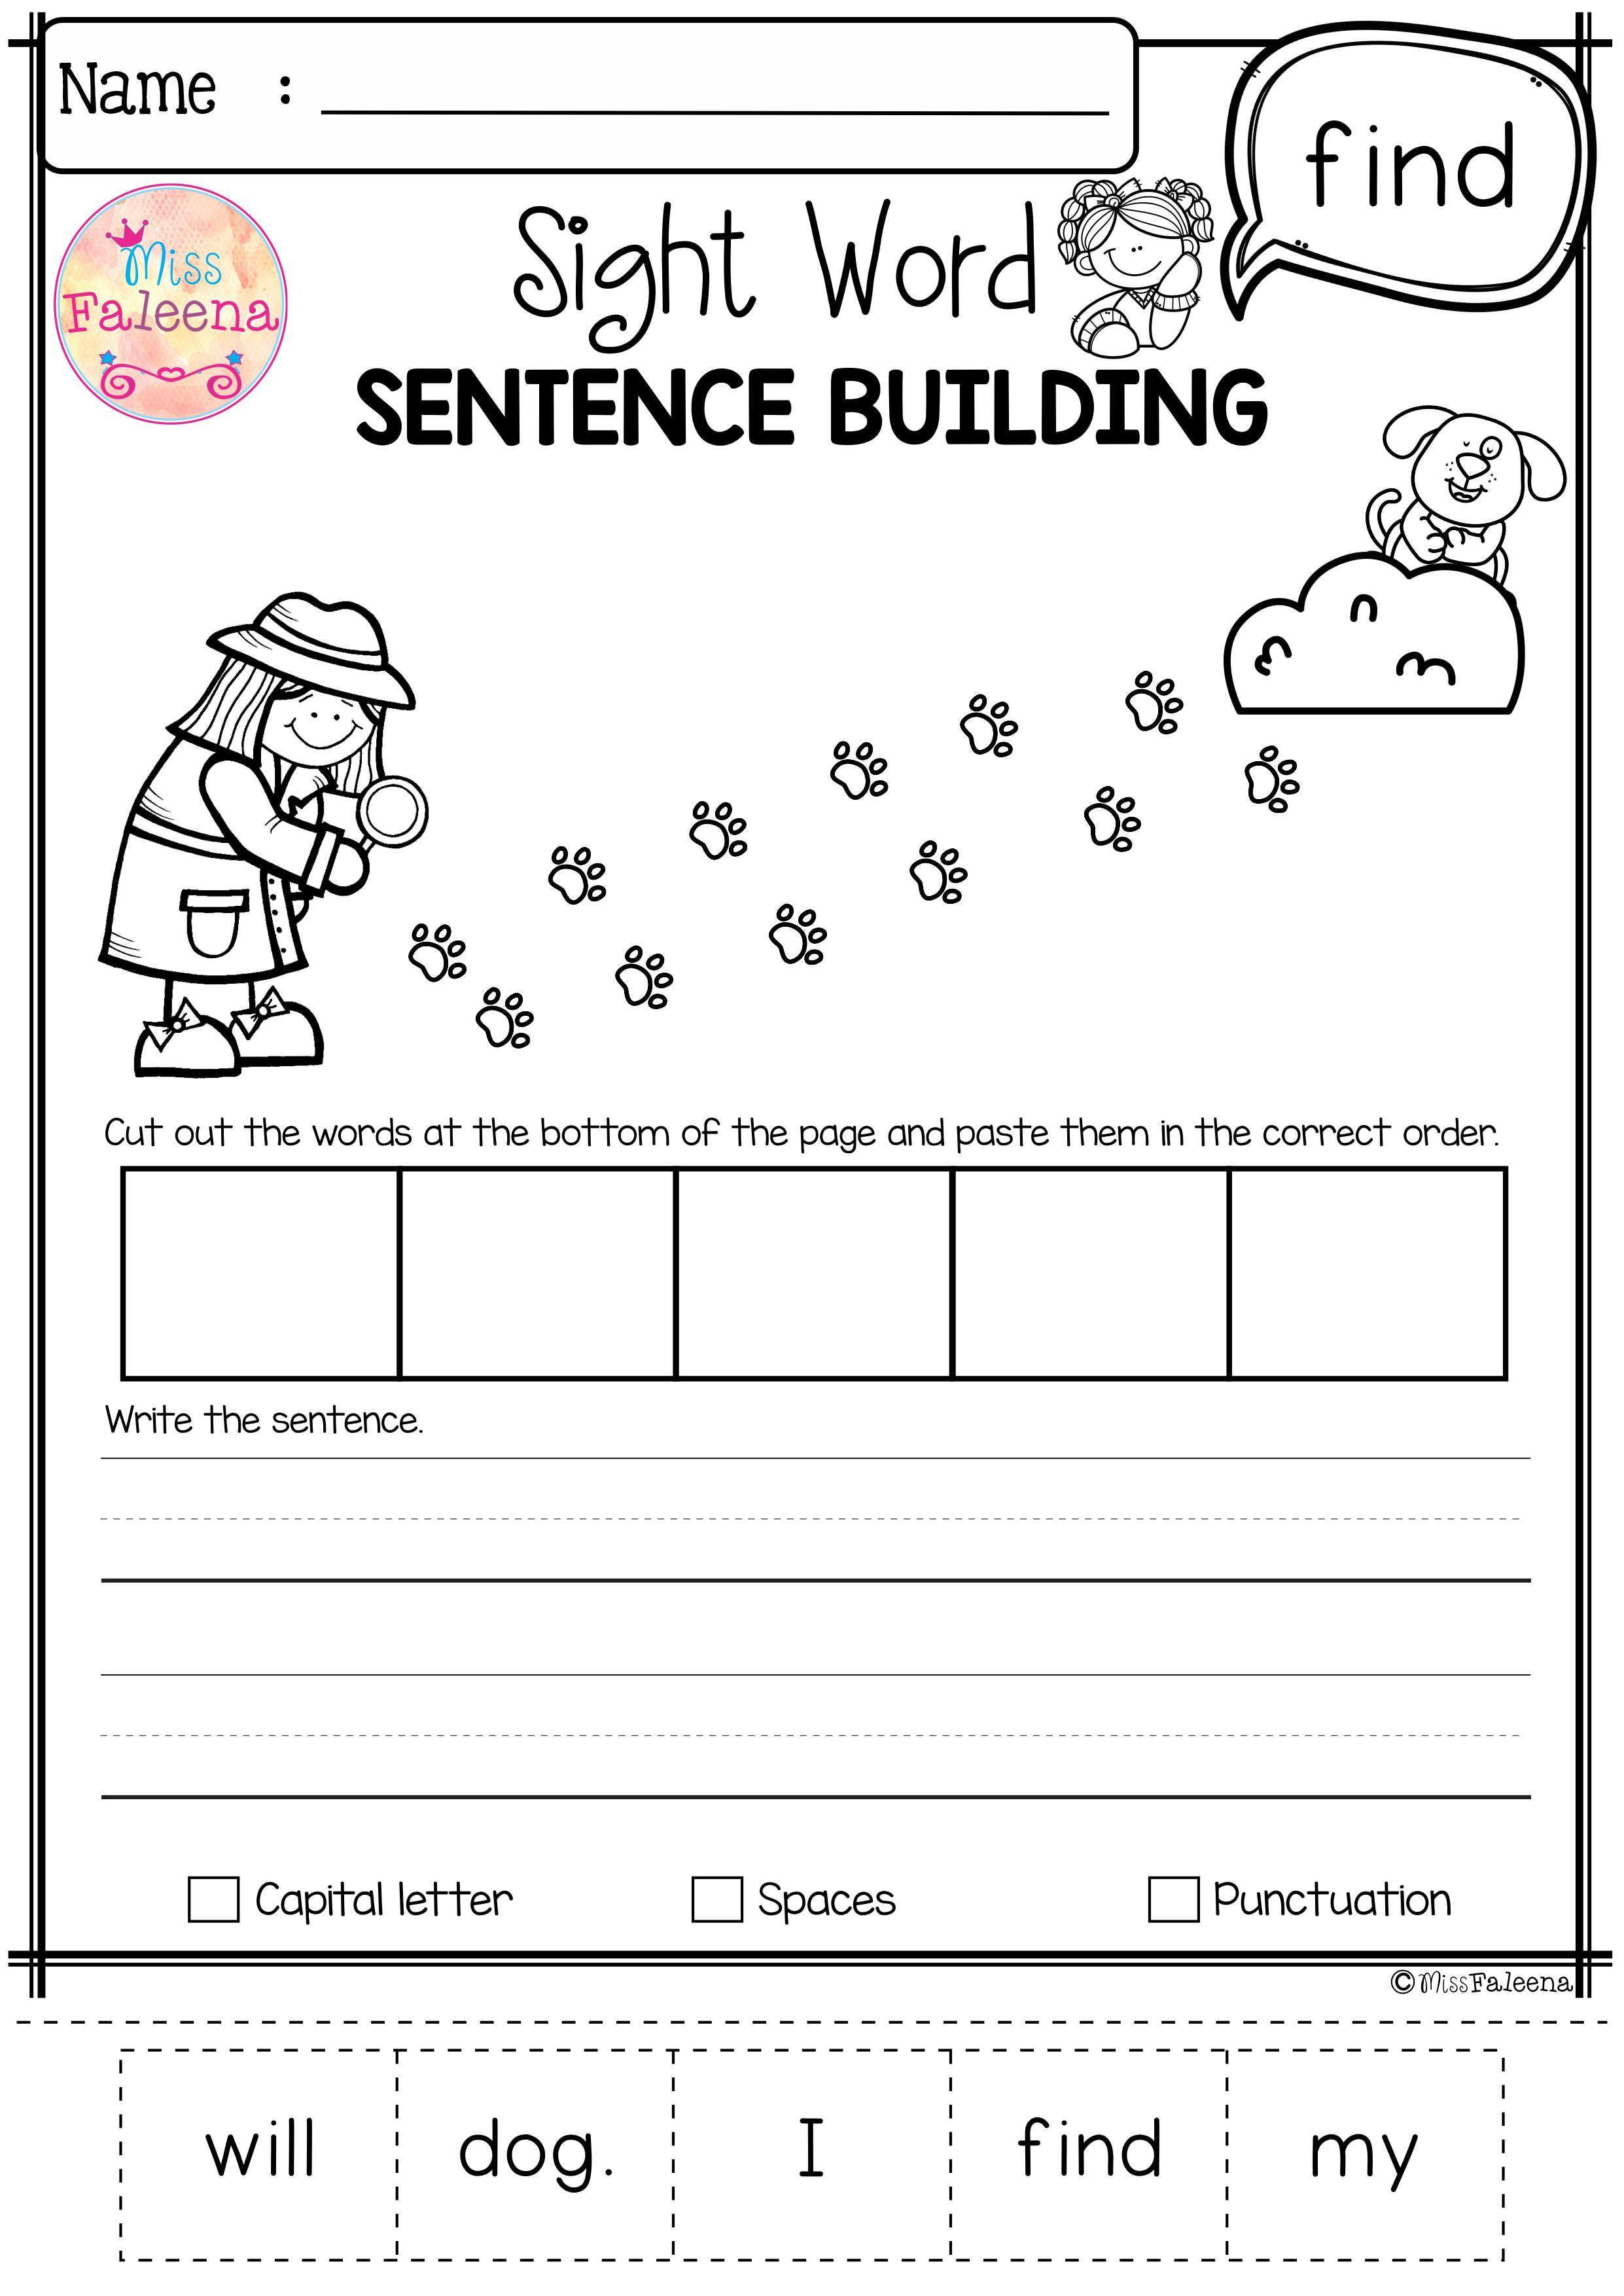 Sight Word Sentence Building Pre Primer Sight Word Sentences Sight Words Word Sentences